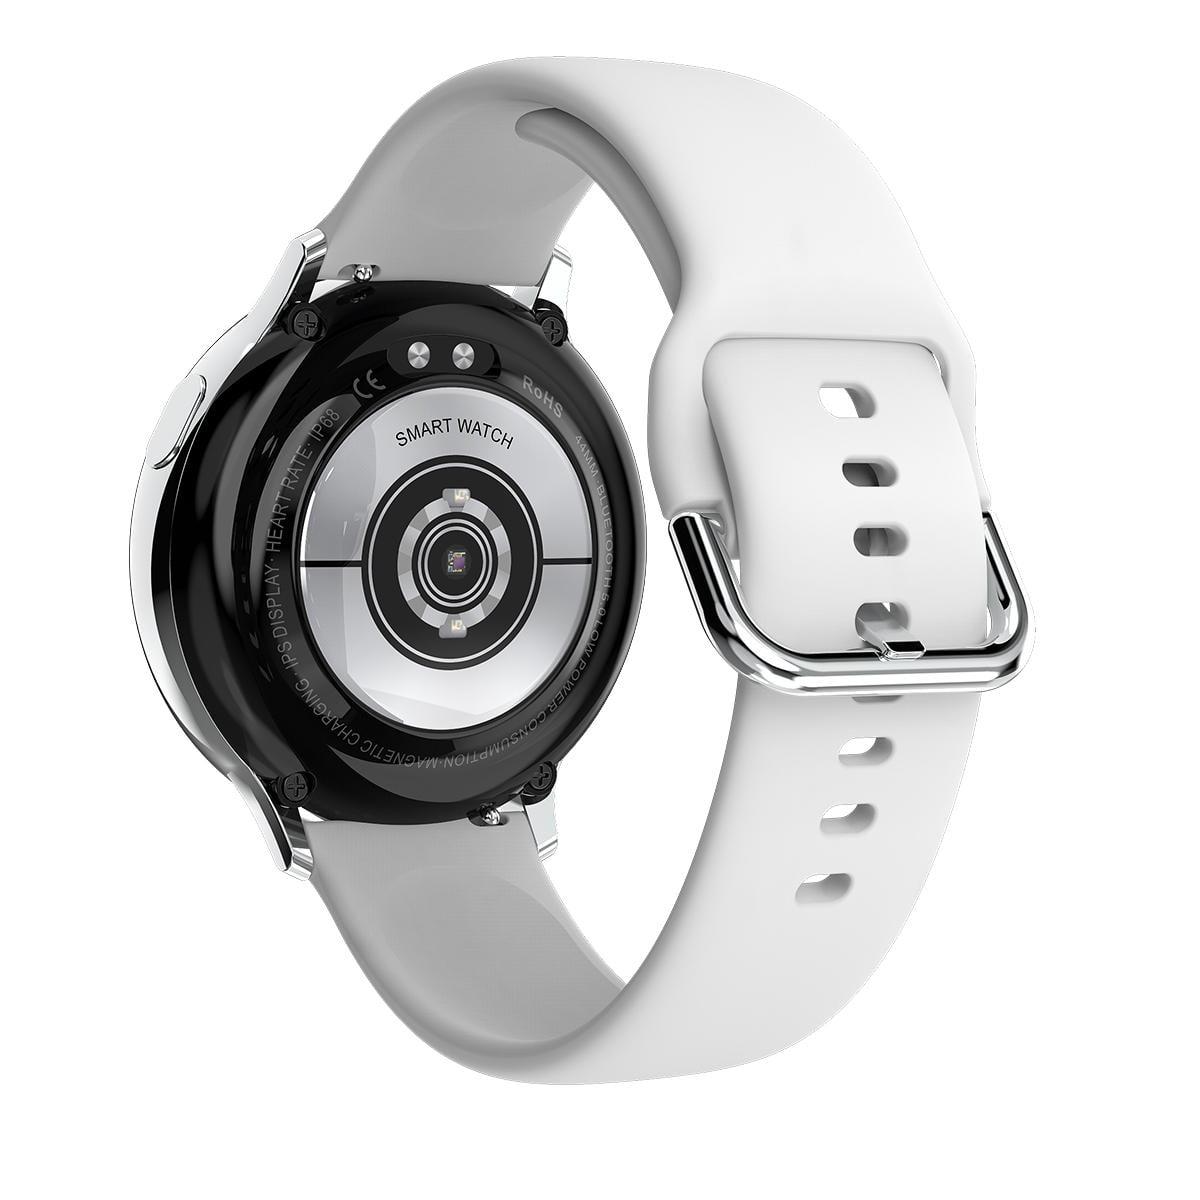 Bakeey smartwatch S20 ECG monitor smart watch heart rate monitor blood pressure (28)